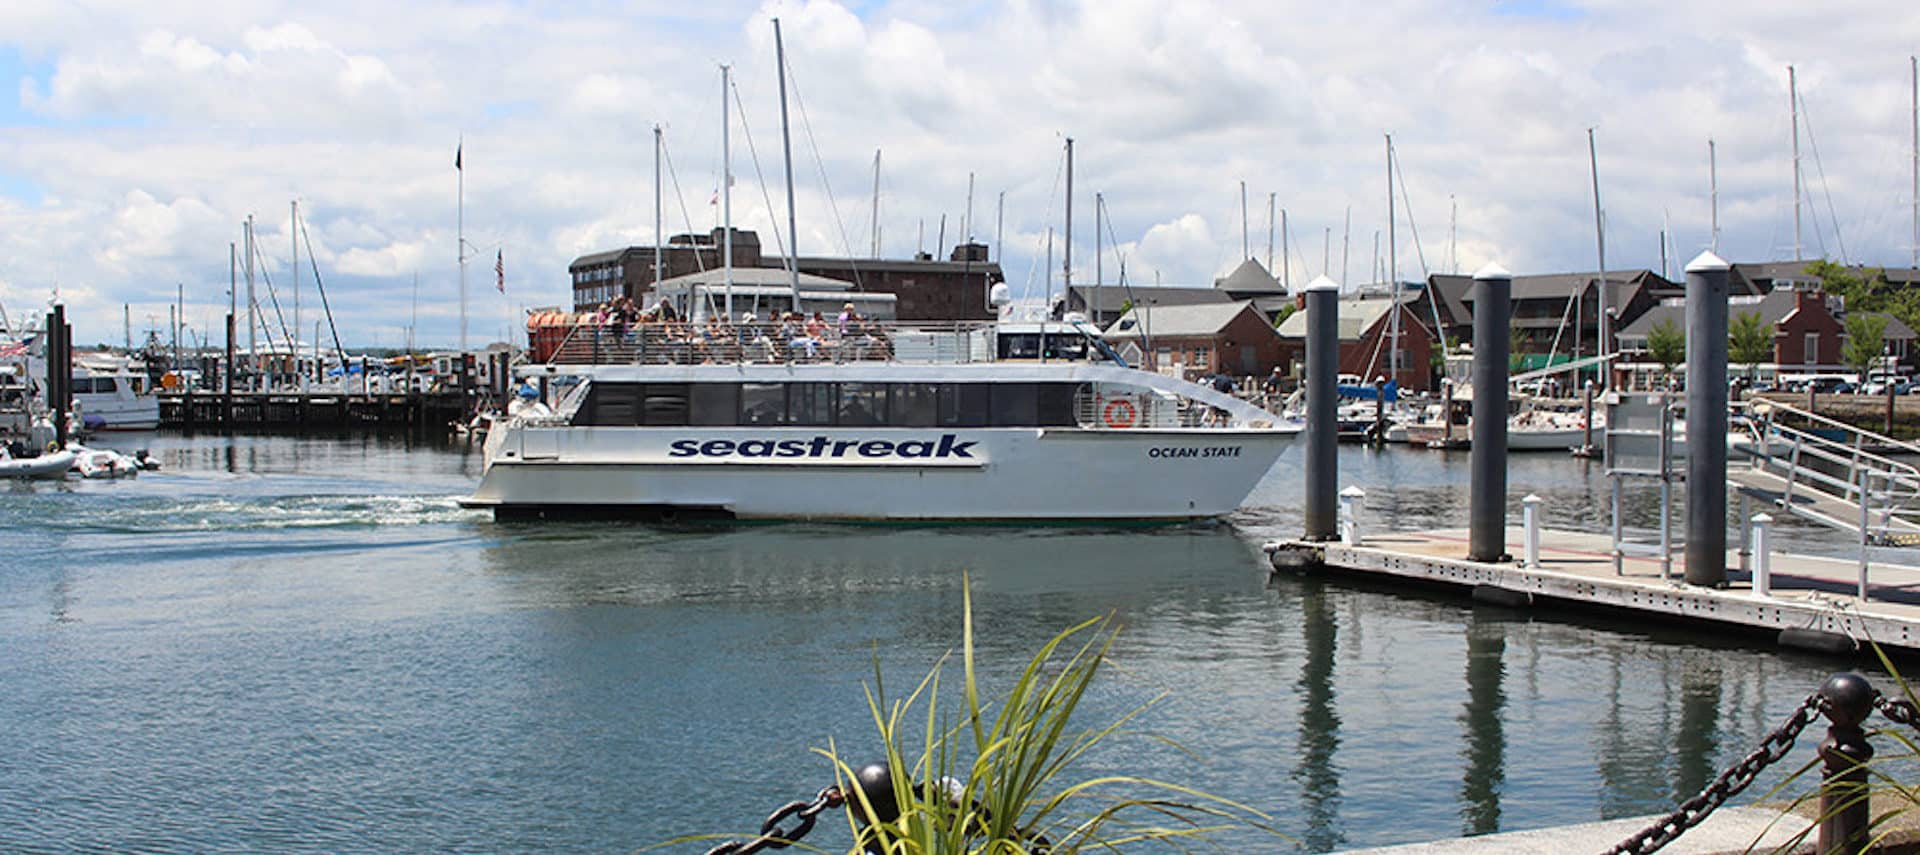 The Sea Streak Ferry docking in sunny Newport, Rhode Island.